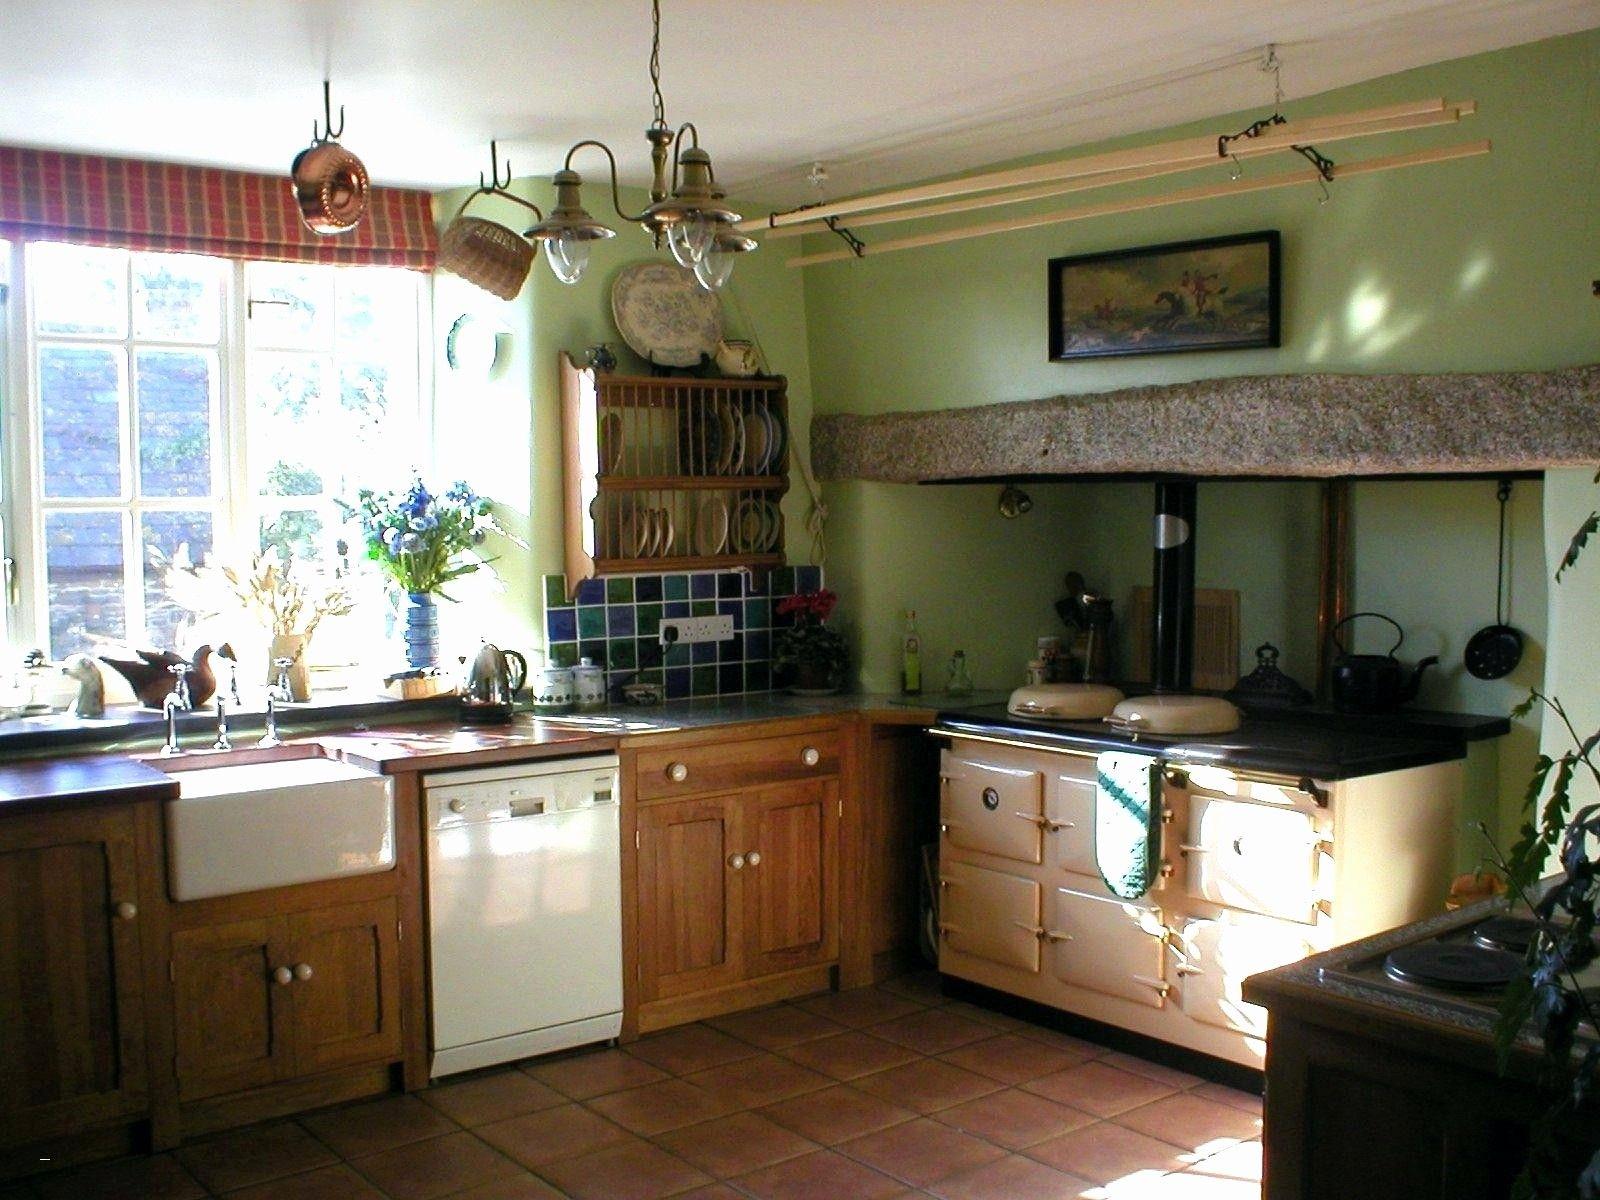 Elegant Houzz Kitchens With White Cabinets Simple Kitchen Design Farmhouse Kitchen Design Green Kitchen Walls